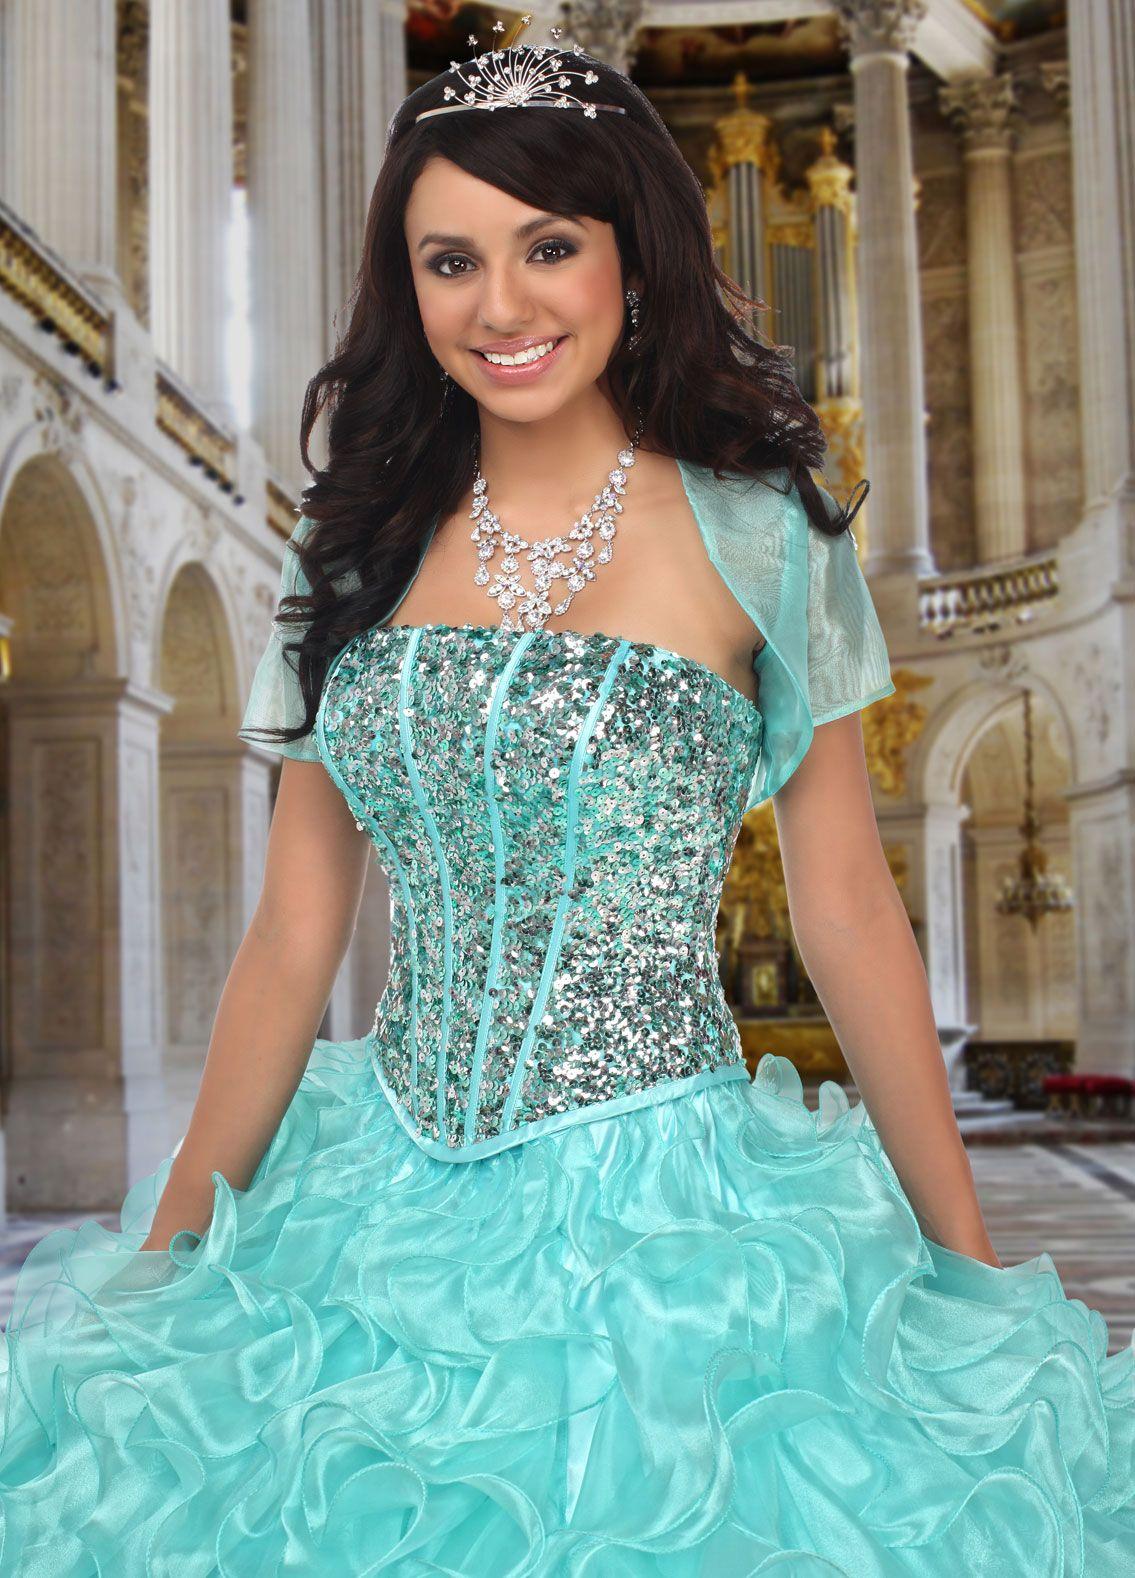 Pin by Priya Avi Sasi on Ball Gowns | Pinterest | Bridal dresses ...